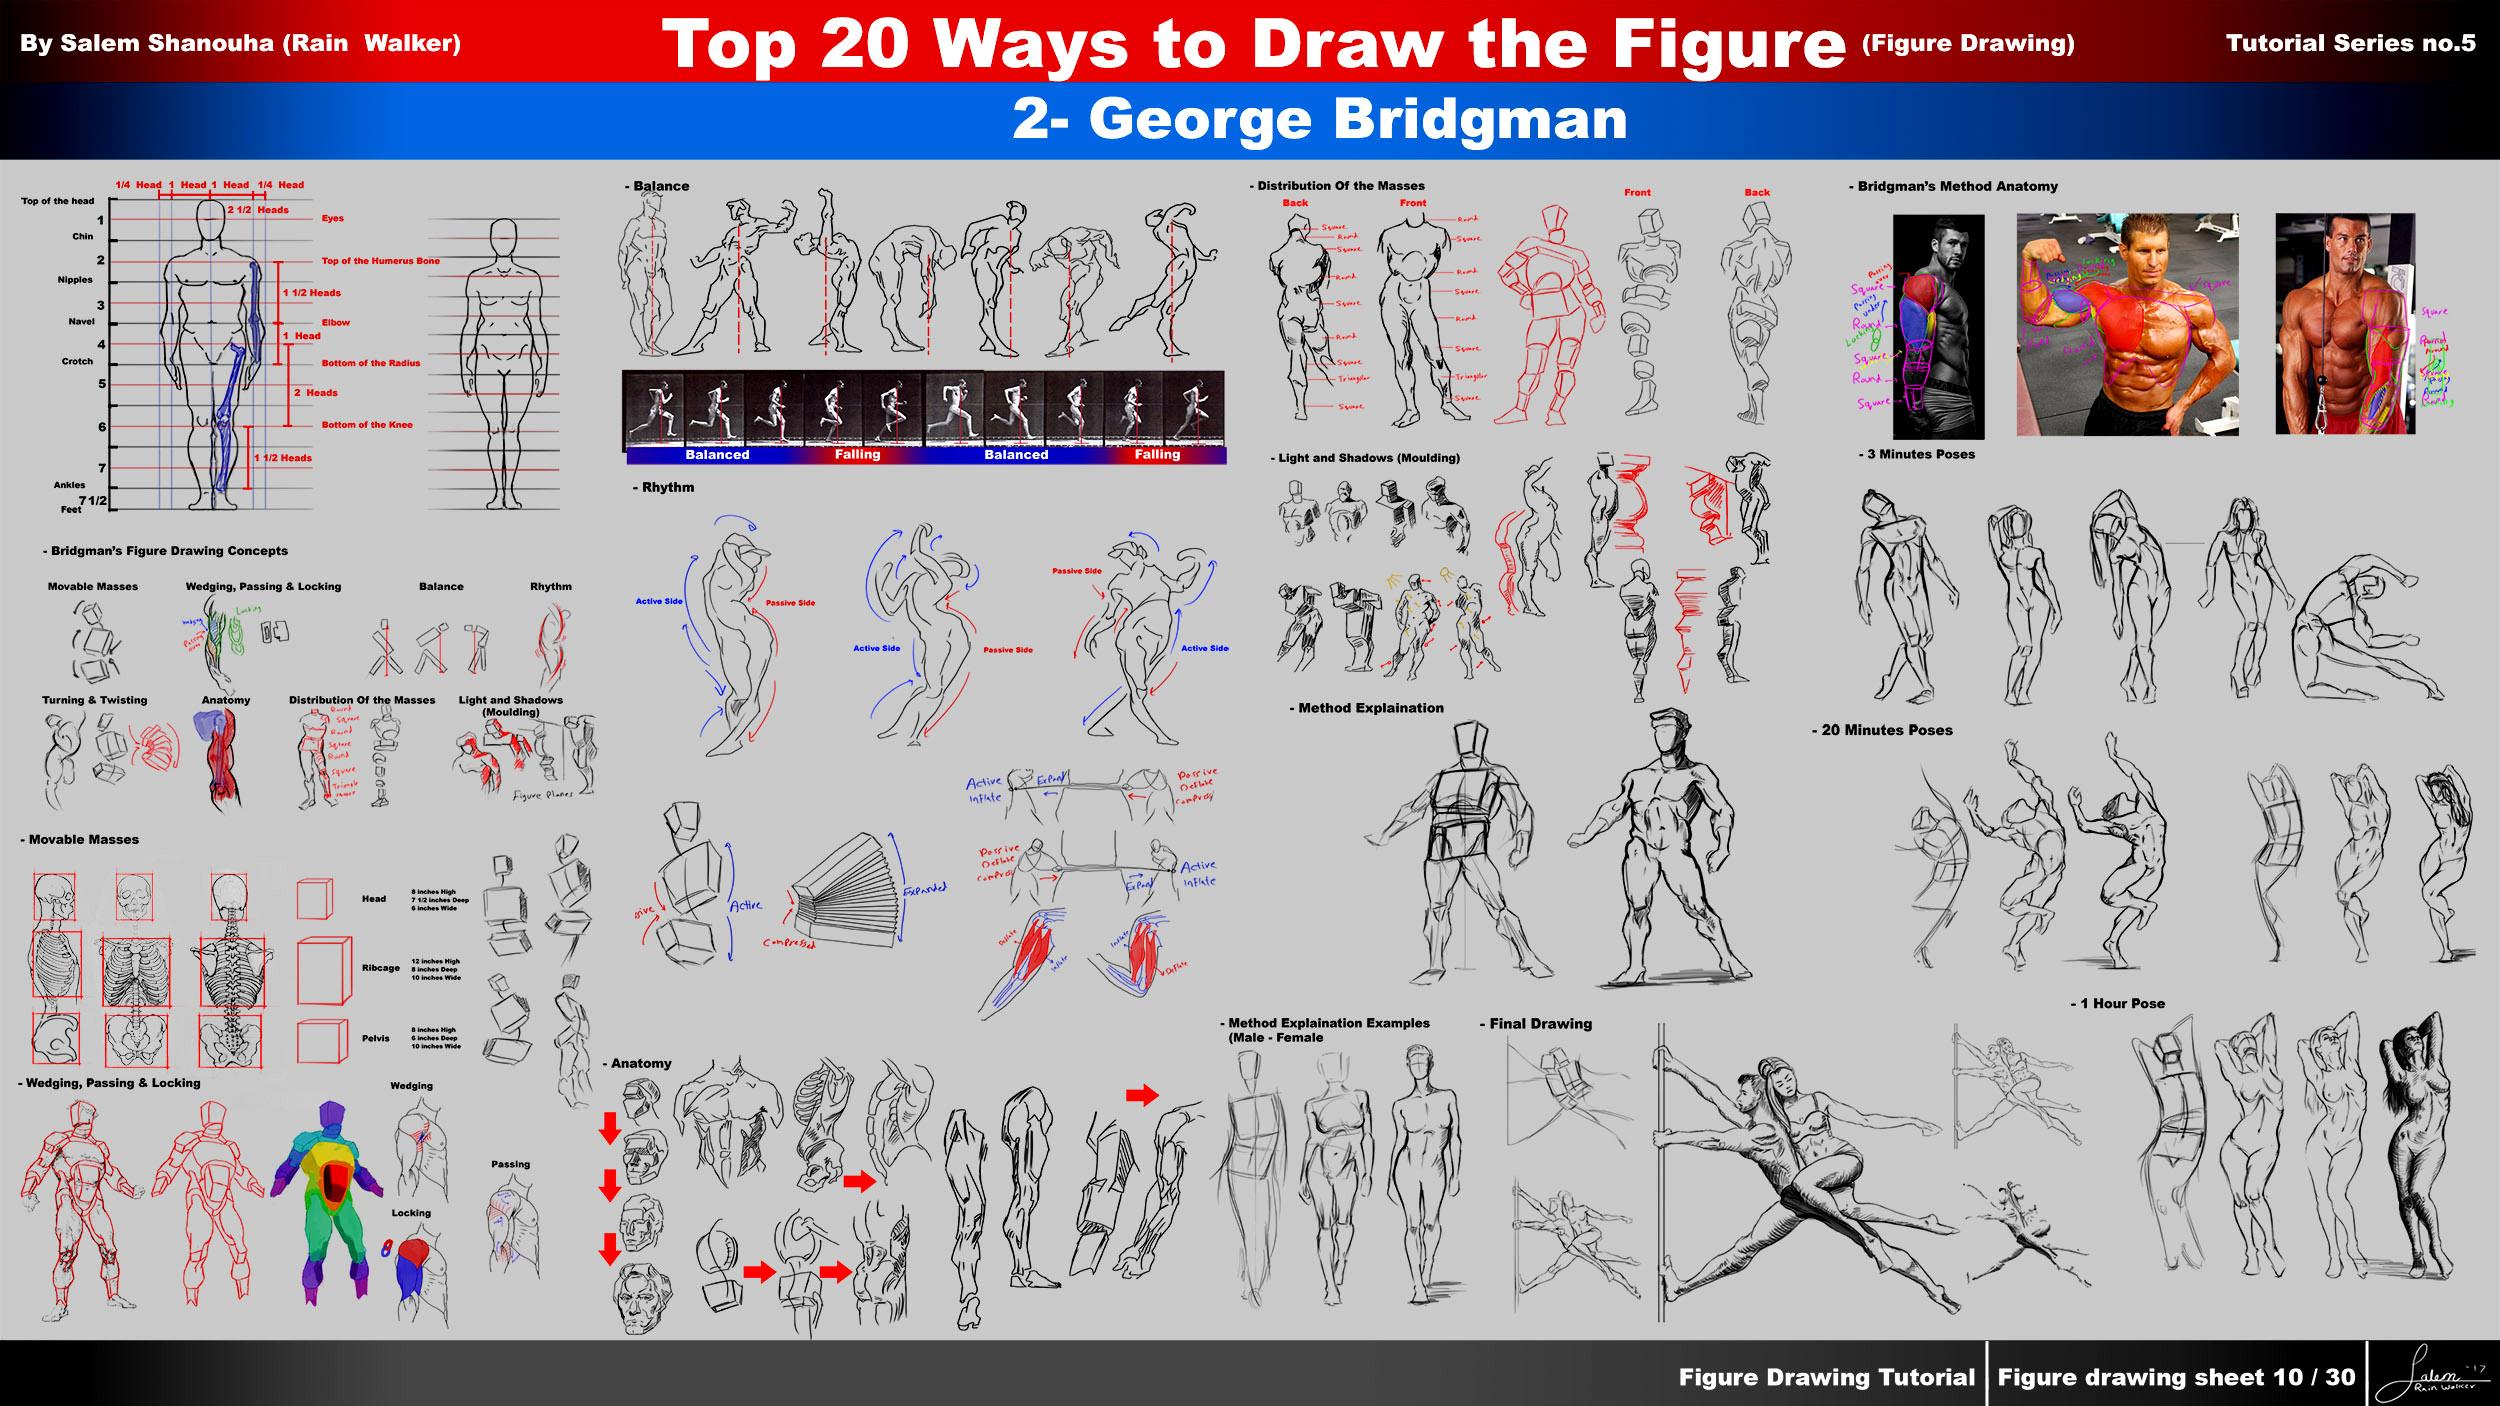 Top 20 Ways to Draw the Figure Chapter 2 (George Bridgman)